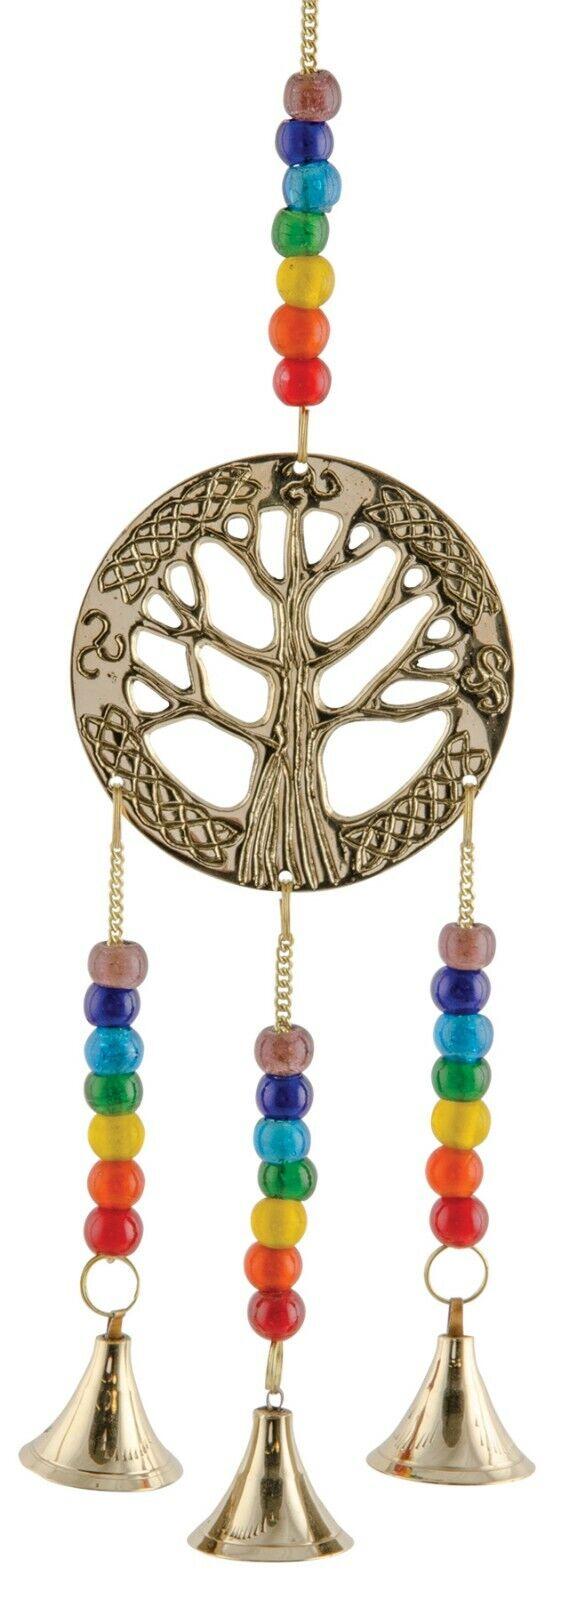 NAMASTE Fair Trade Hanging Tree of Life with Chakra Beads FAIRTRADE Boho